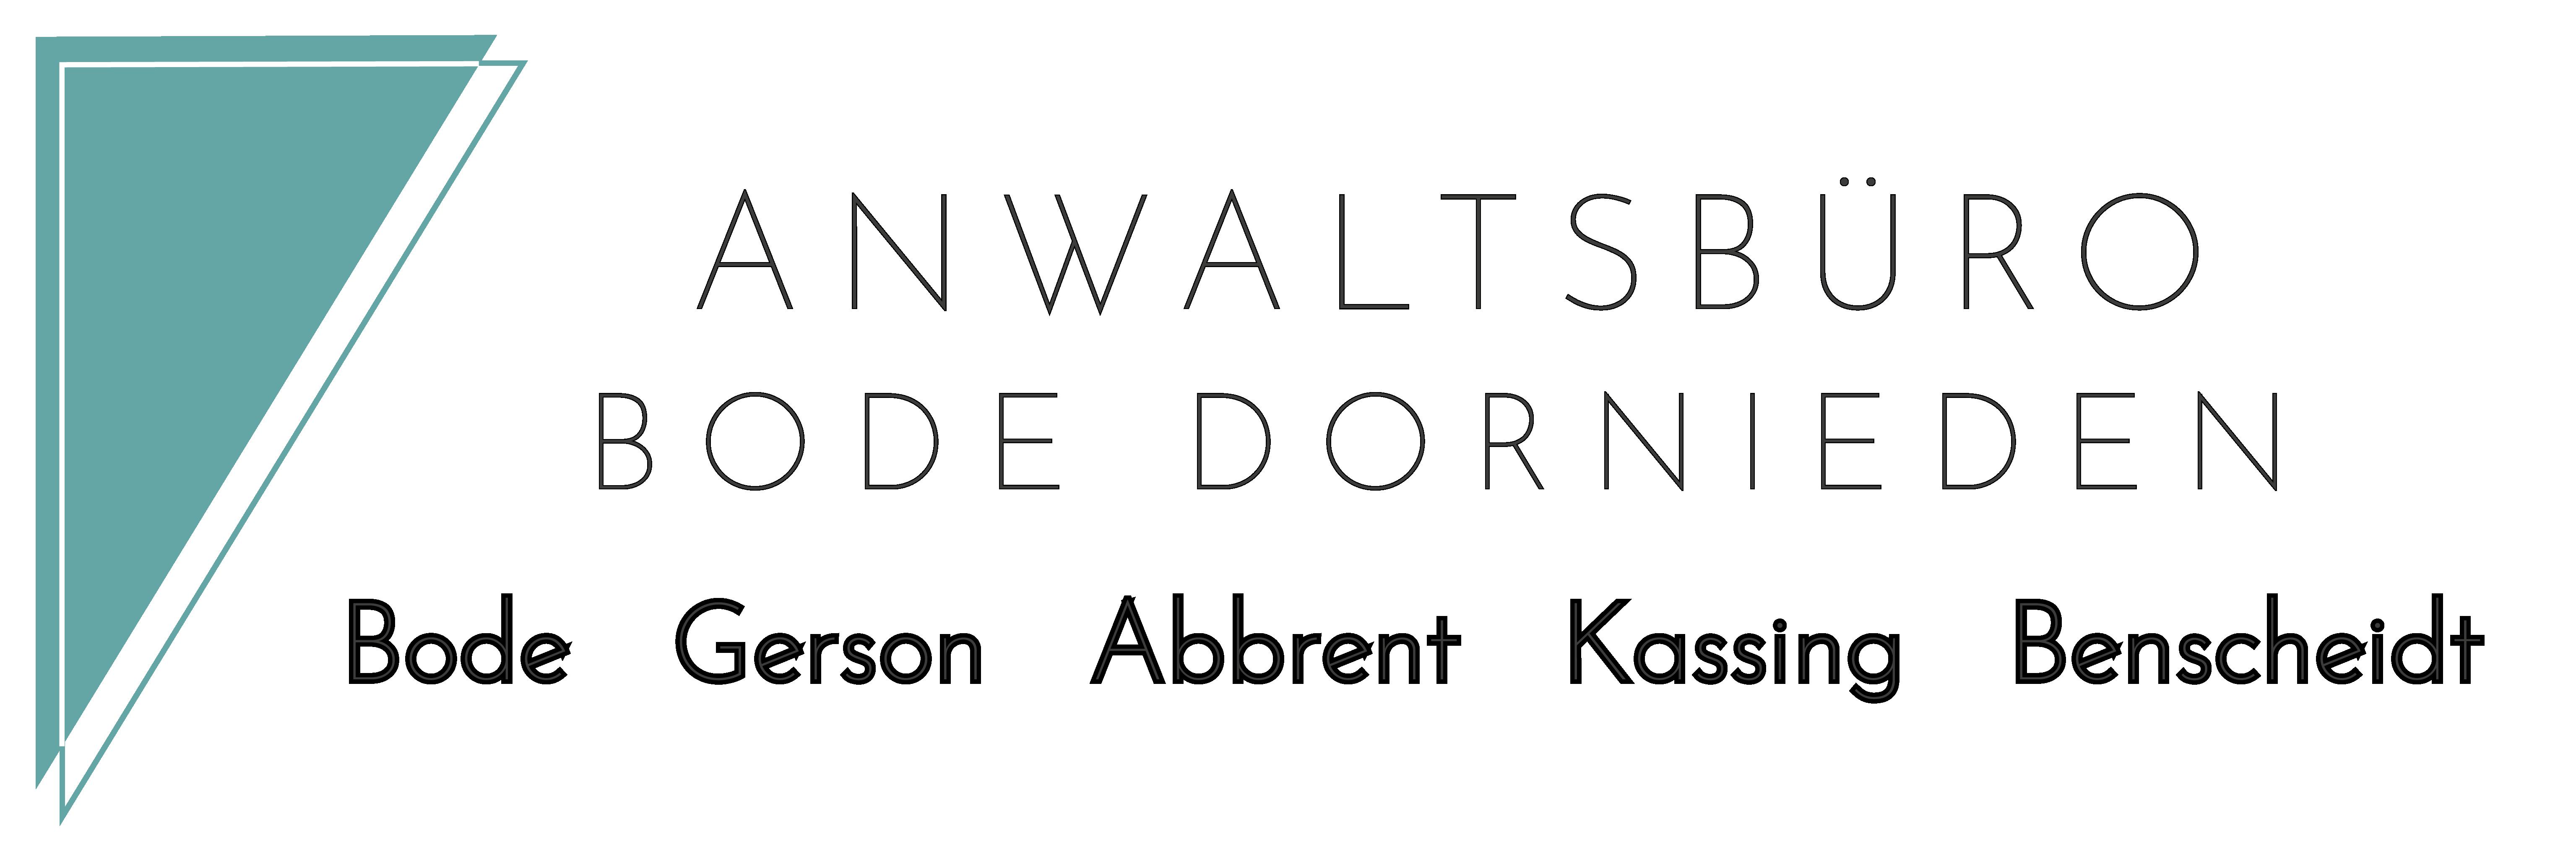 Anwaltsbüro Bode Dornieden